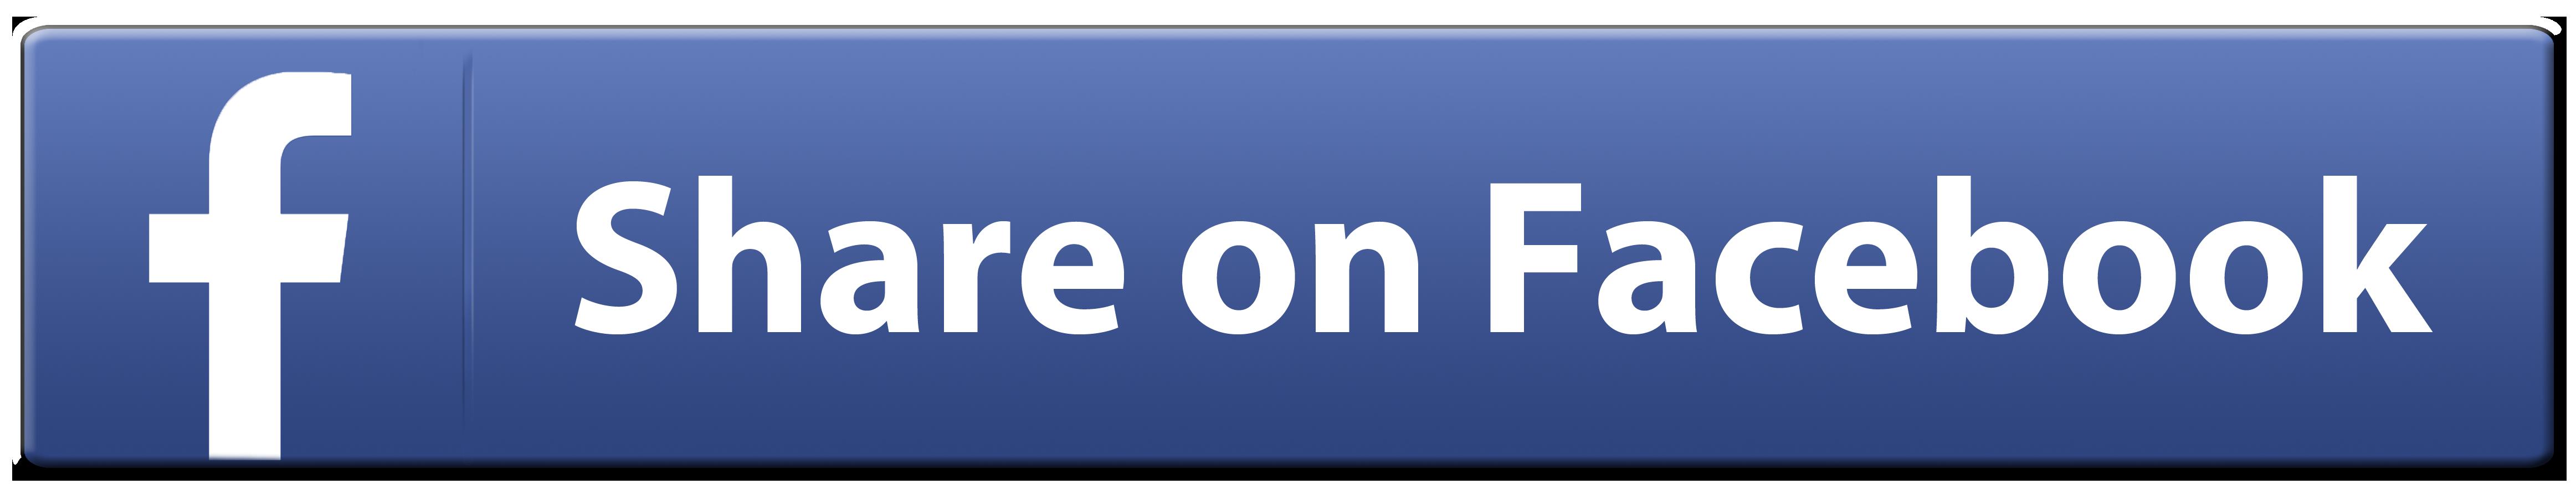 facebookshare.png